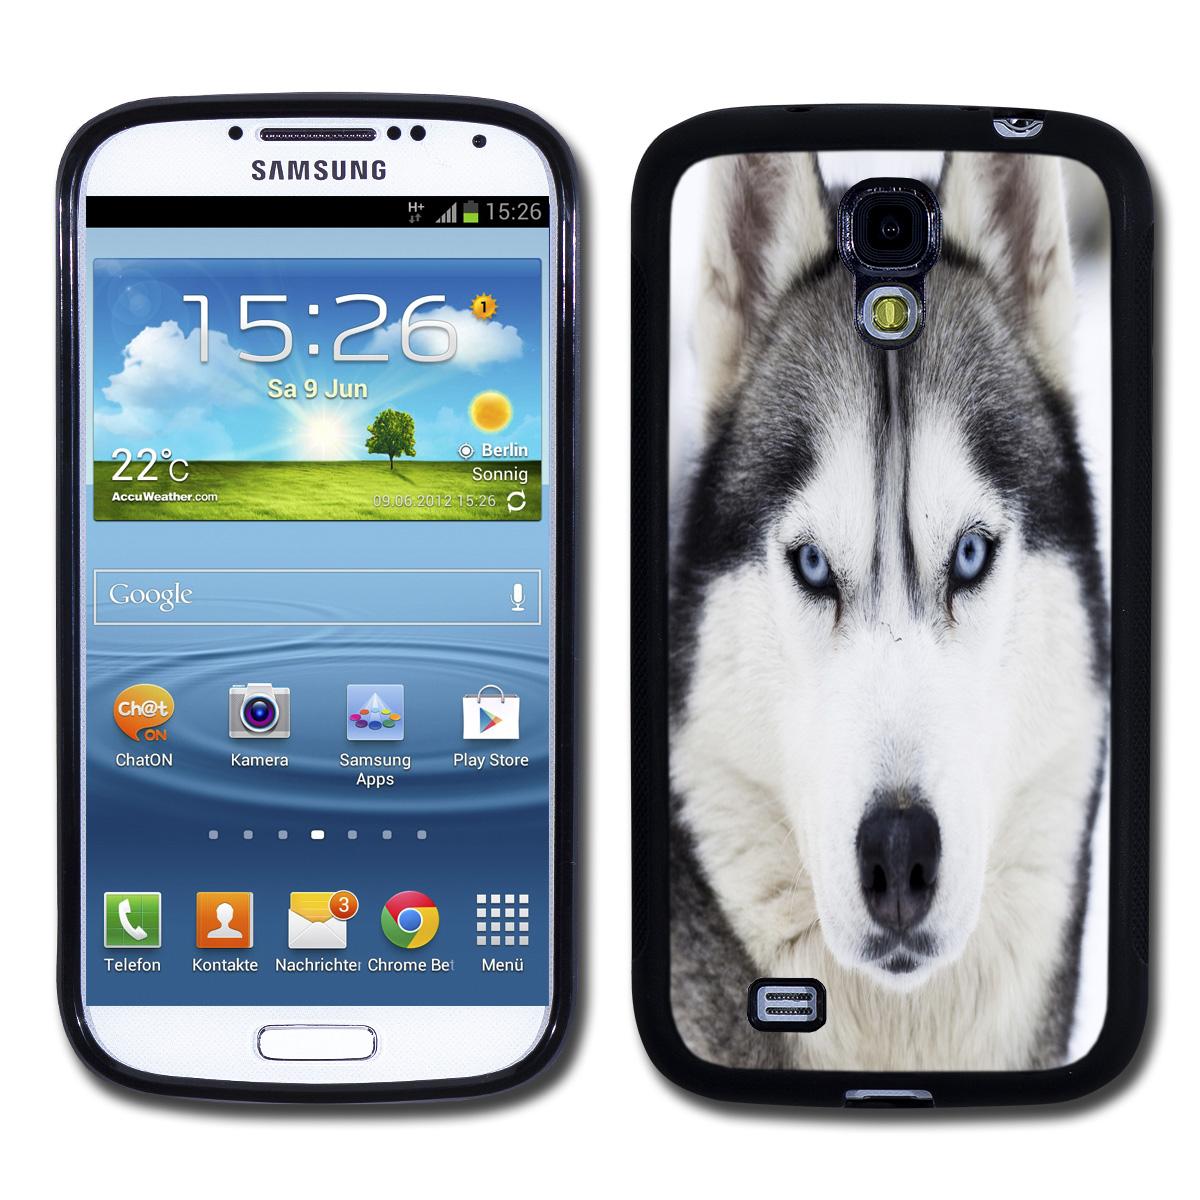 TPU-Style-etui-en-silicone-Coque-pour-telephone-portable-de-protection-A54